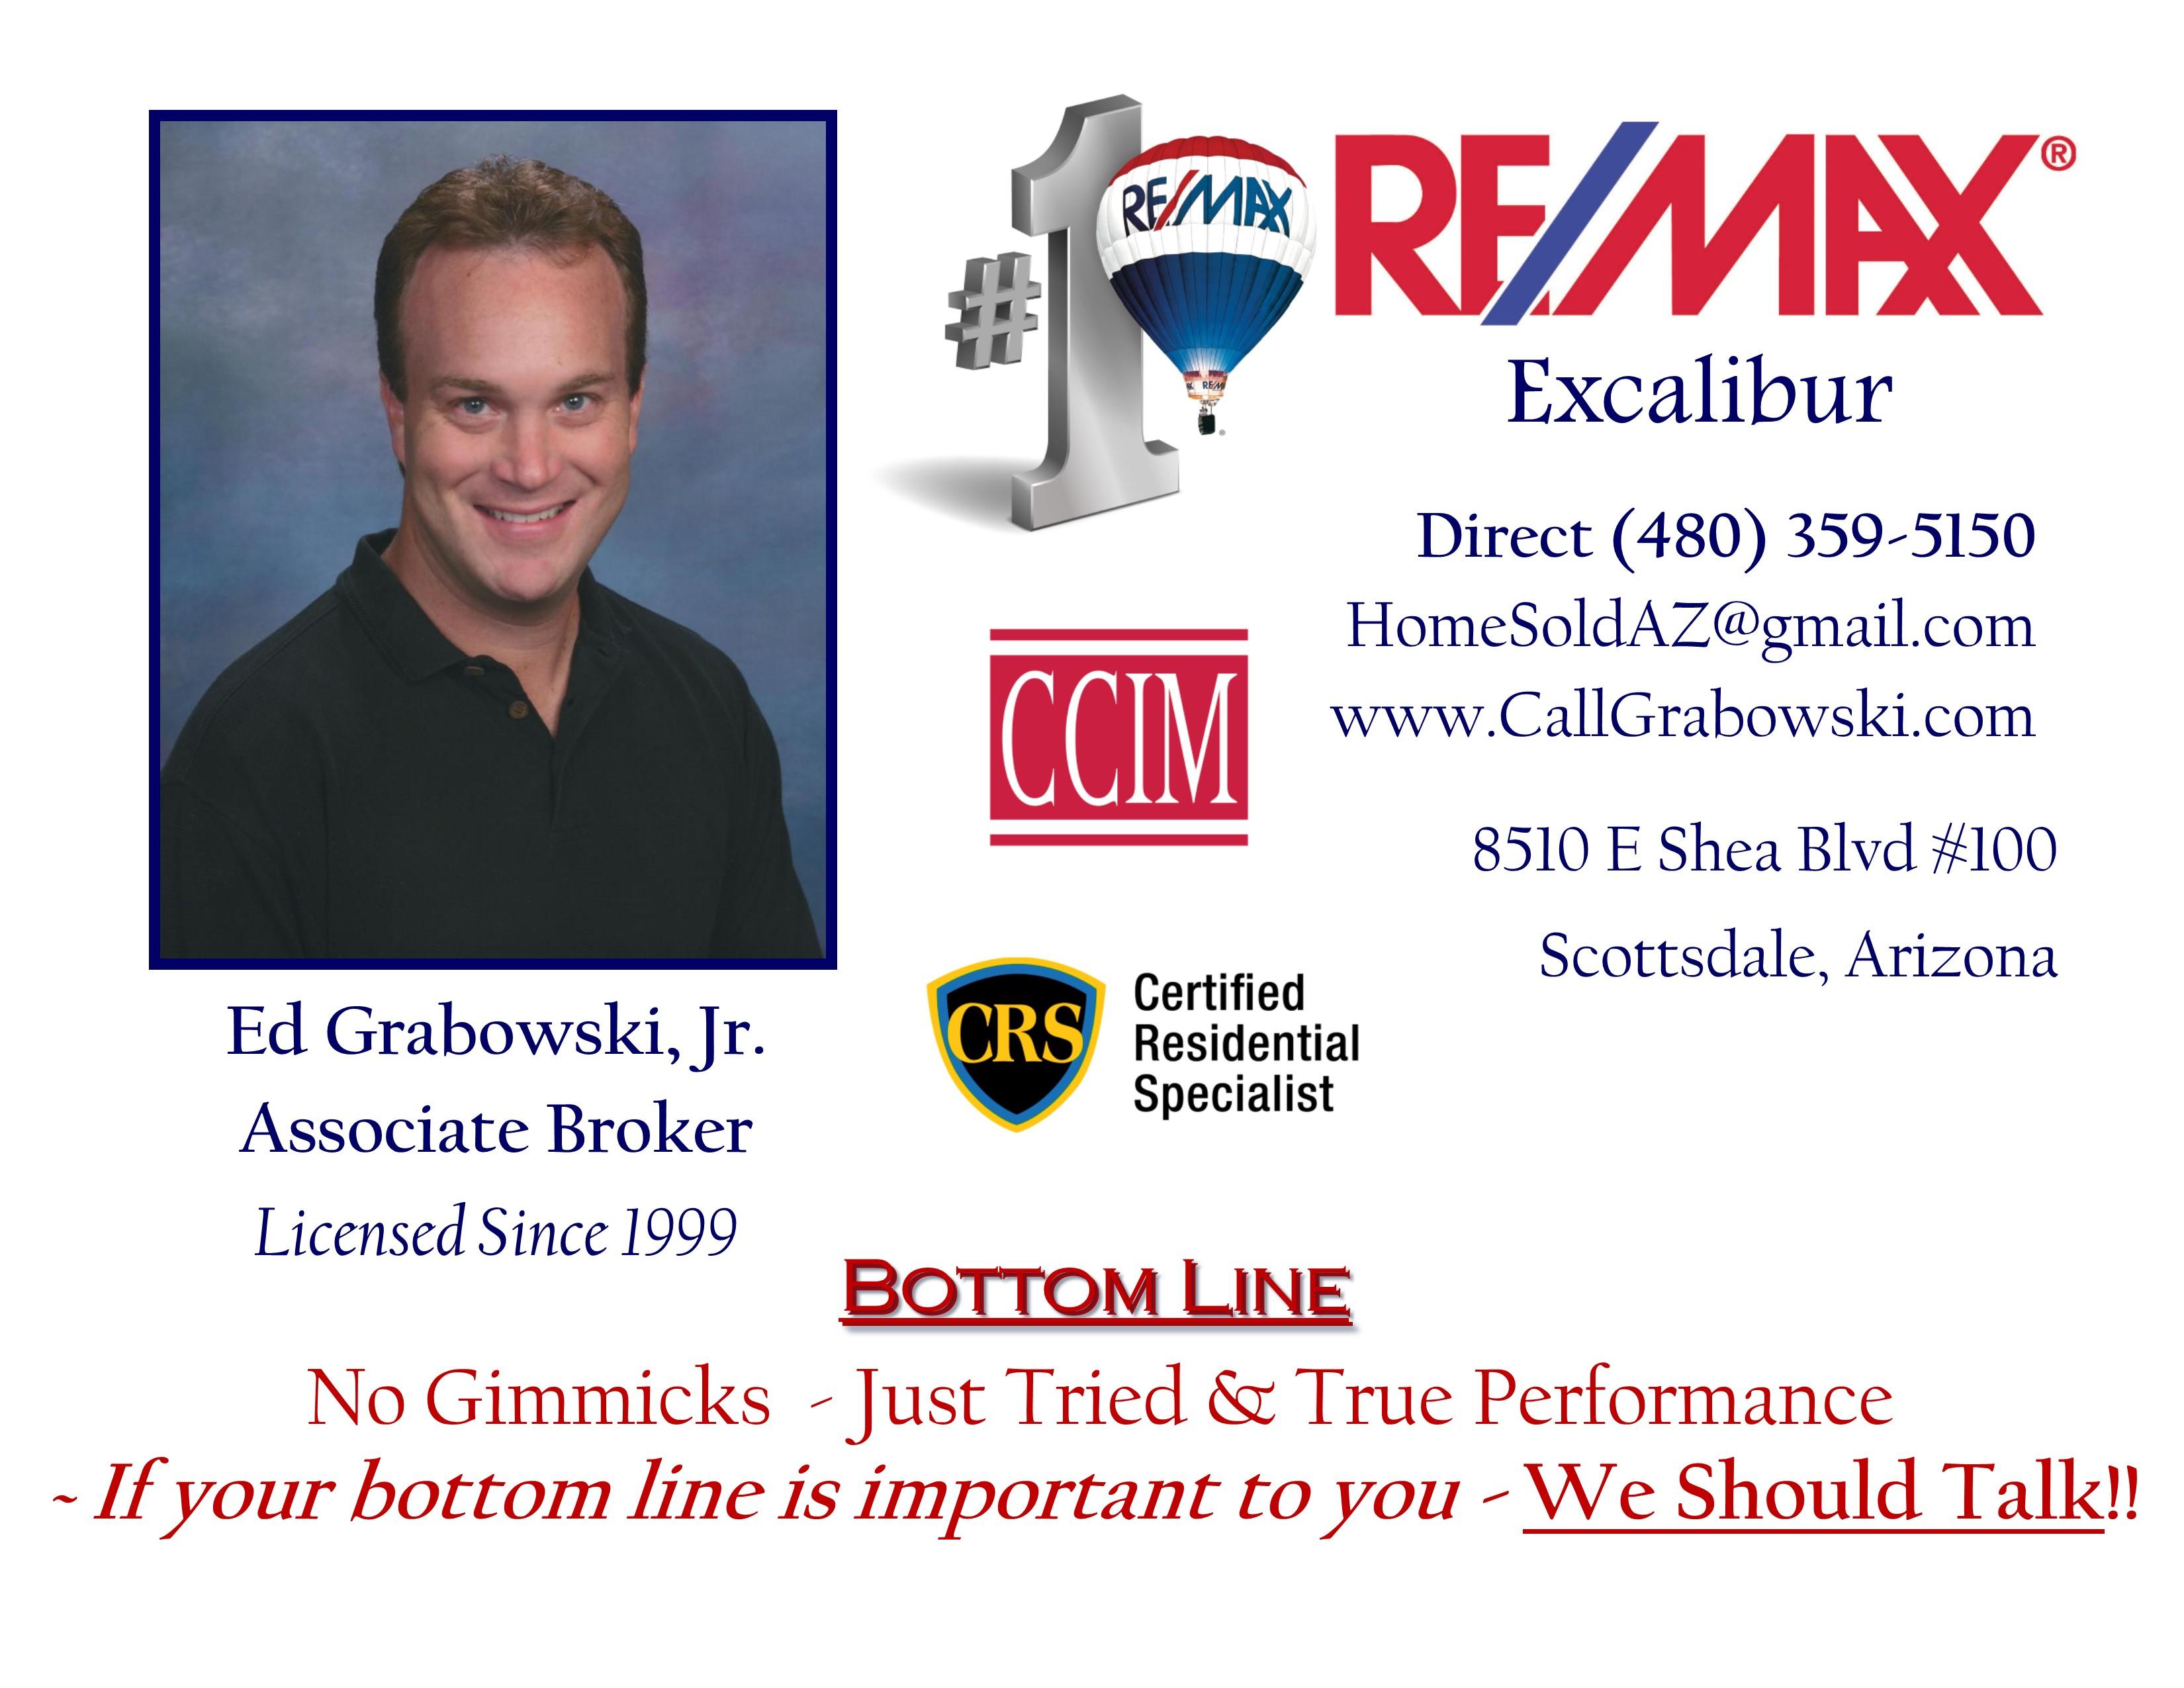 Ed Grabowski, Jr.